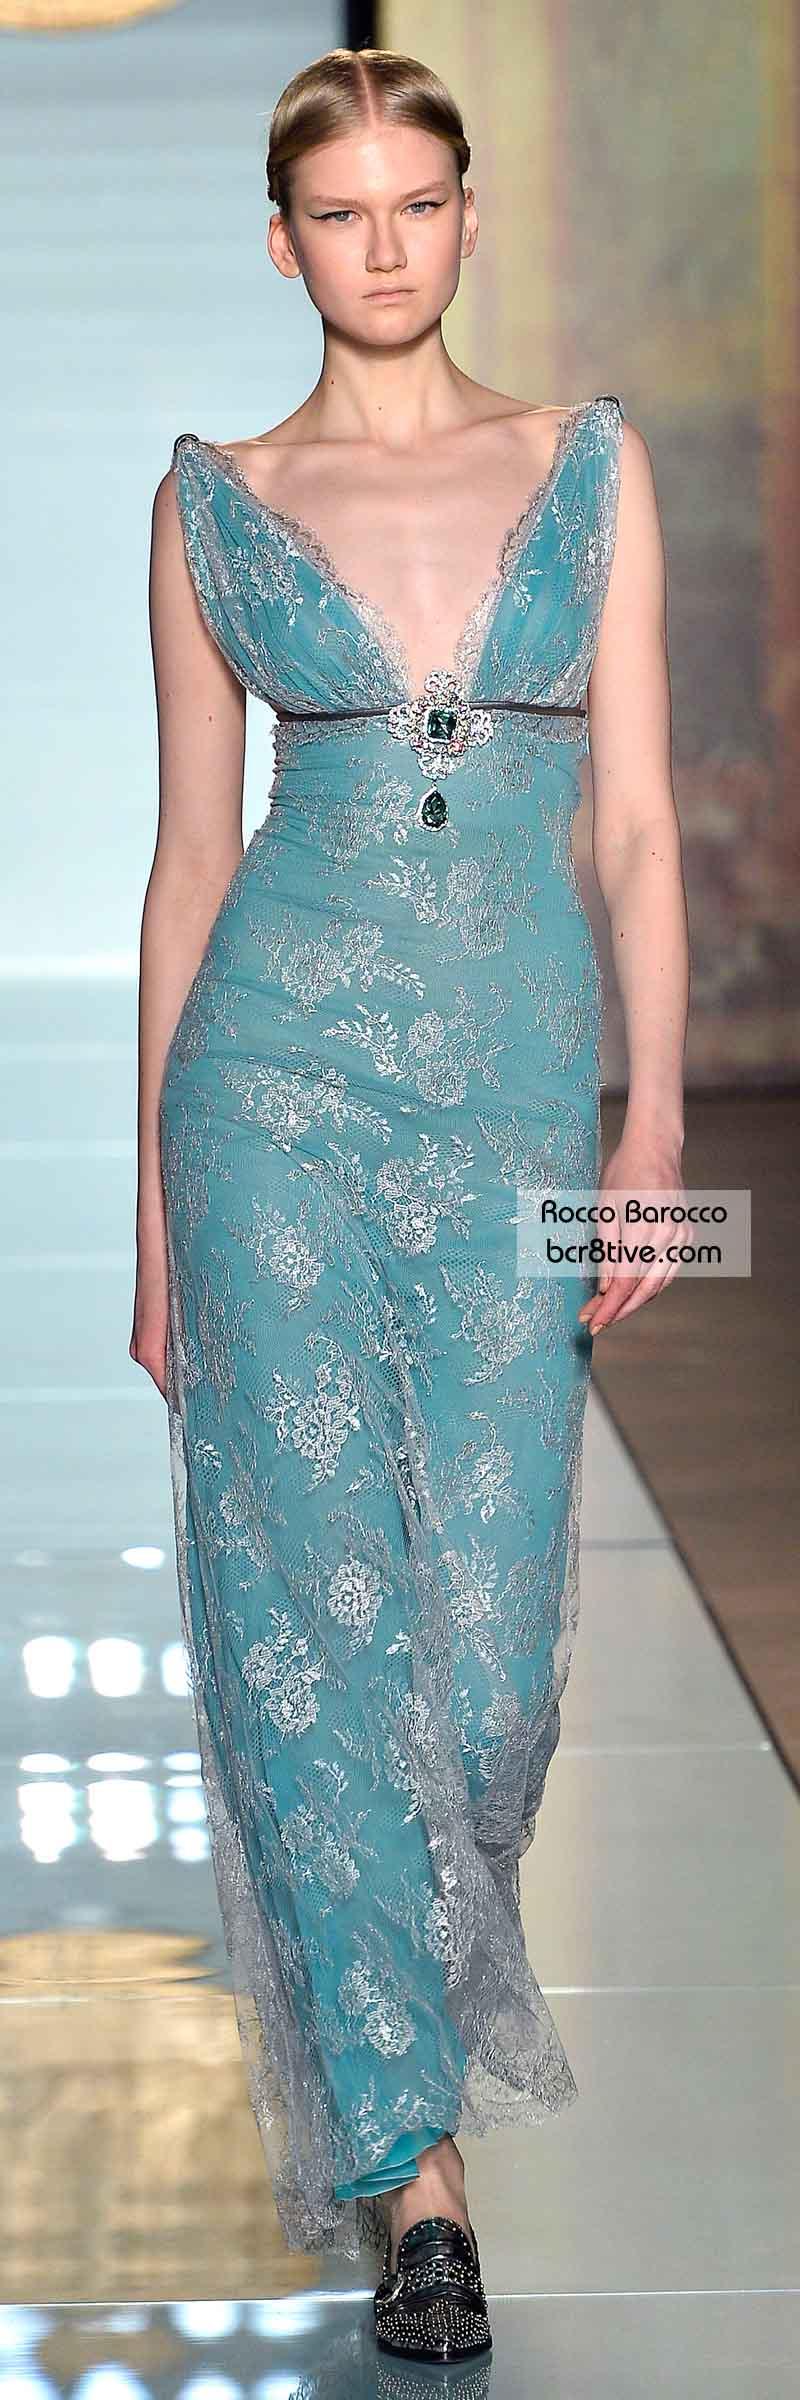 Best Gowns of Fall 2014 Fashion Week International - 5